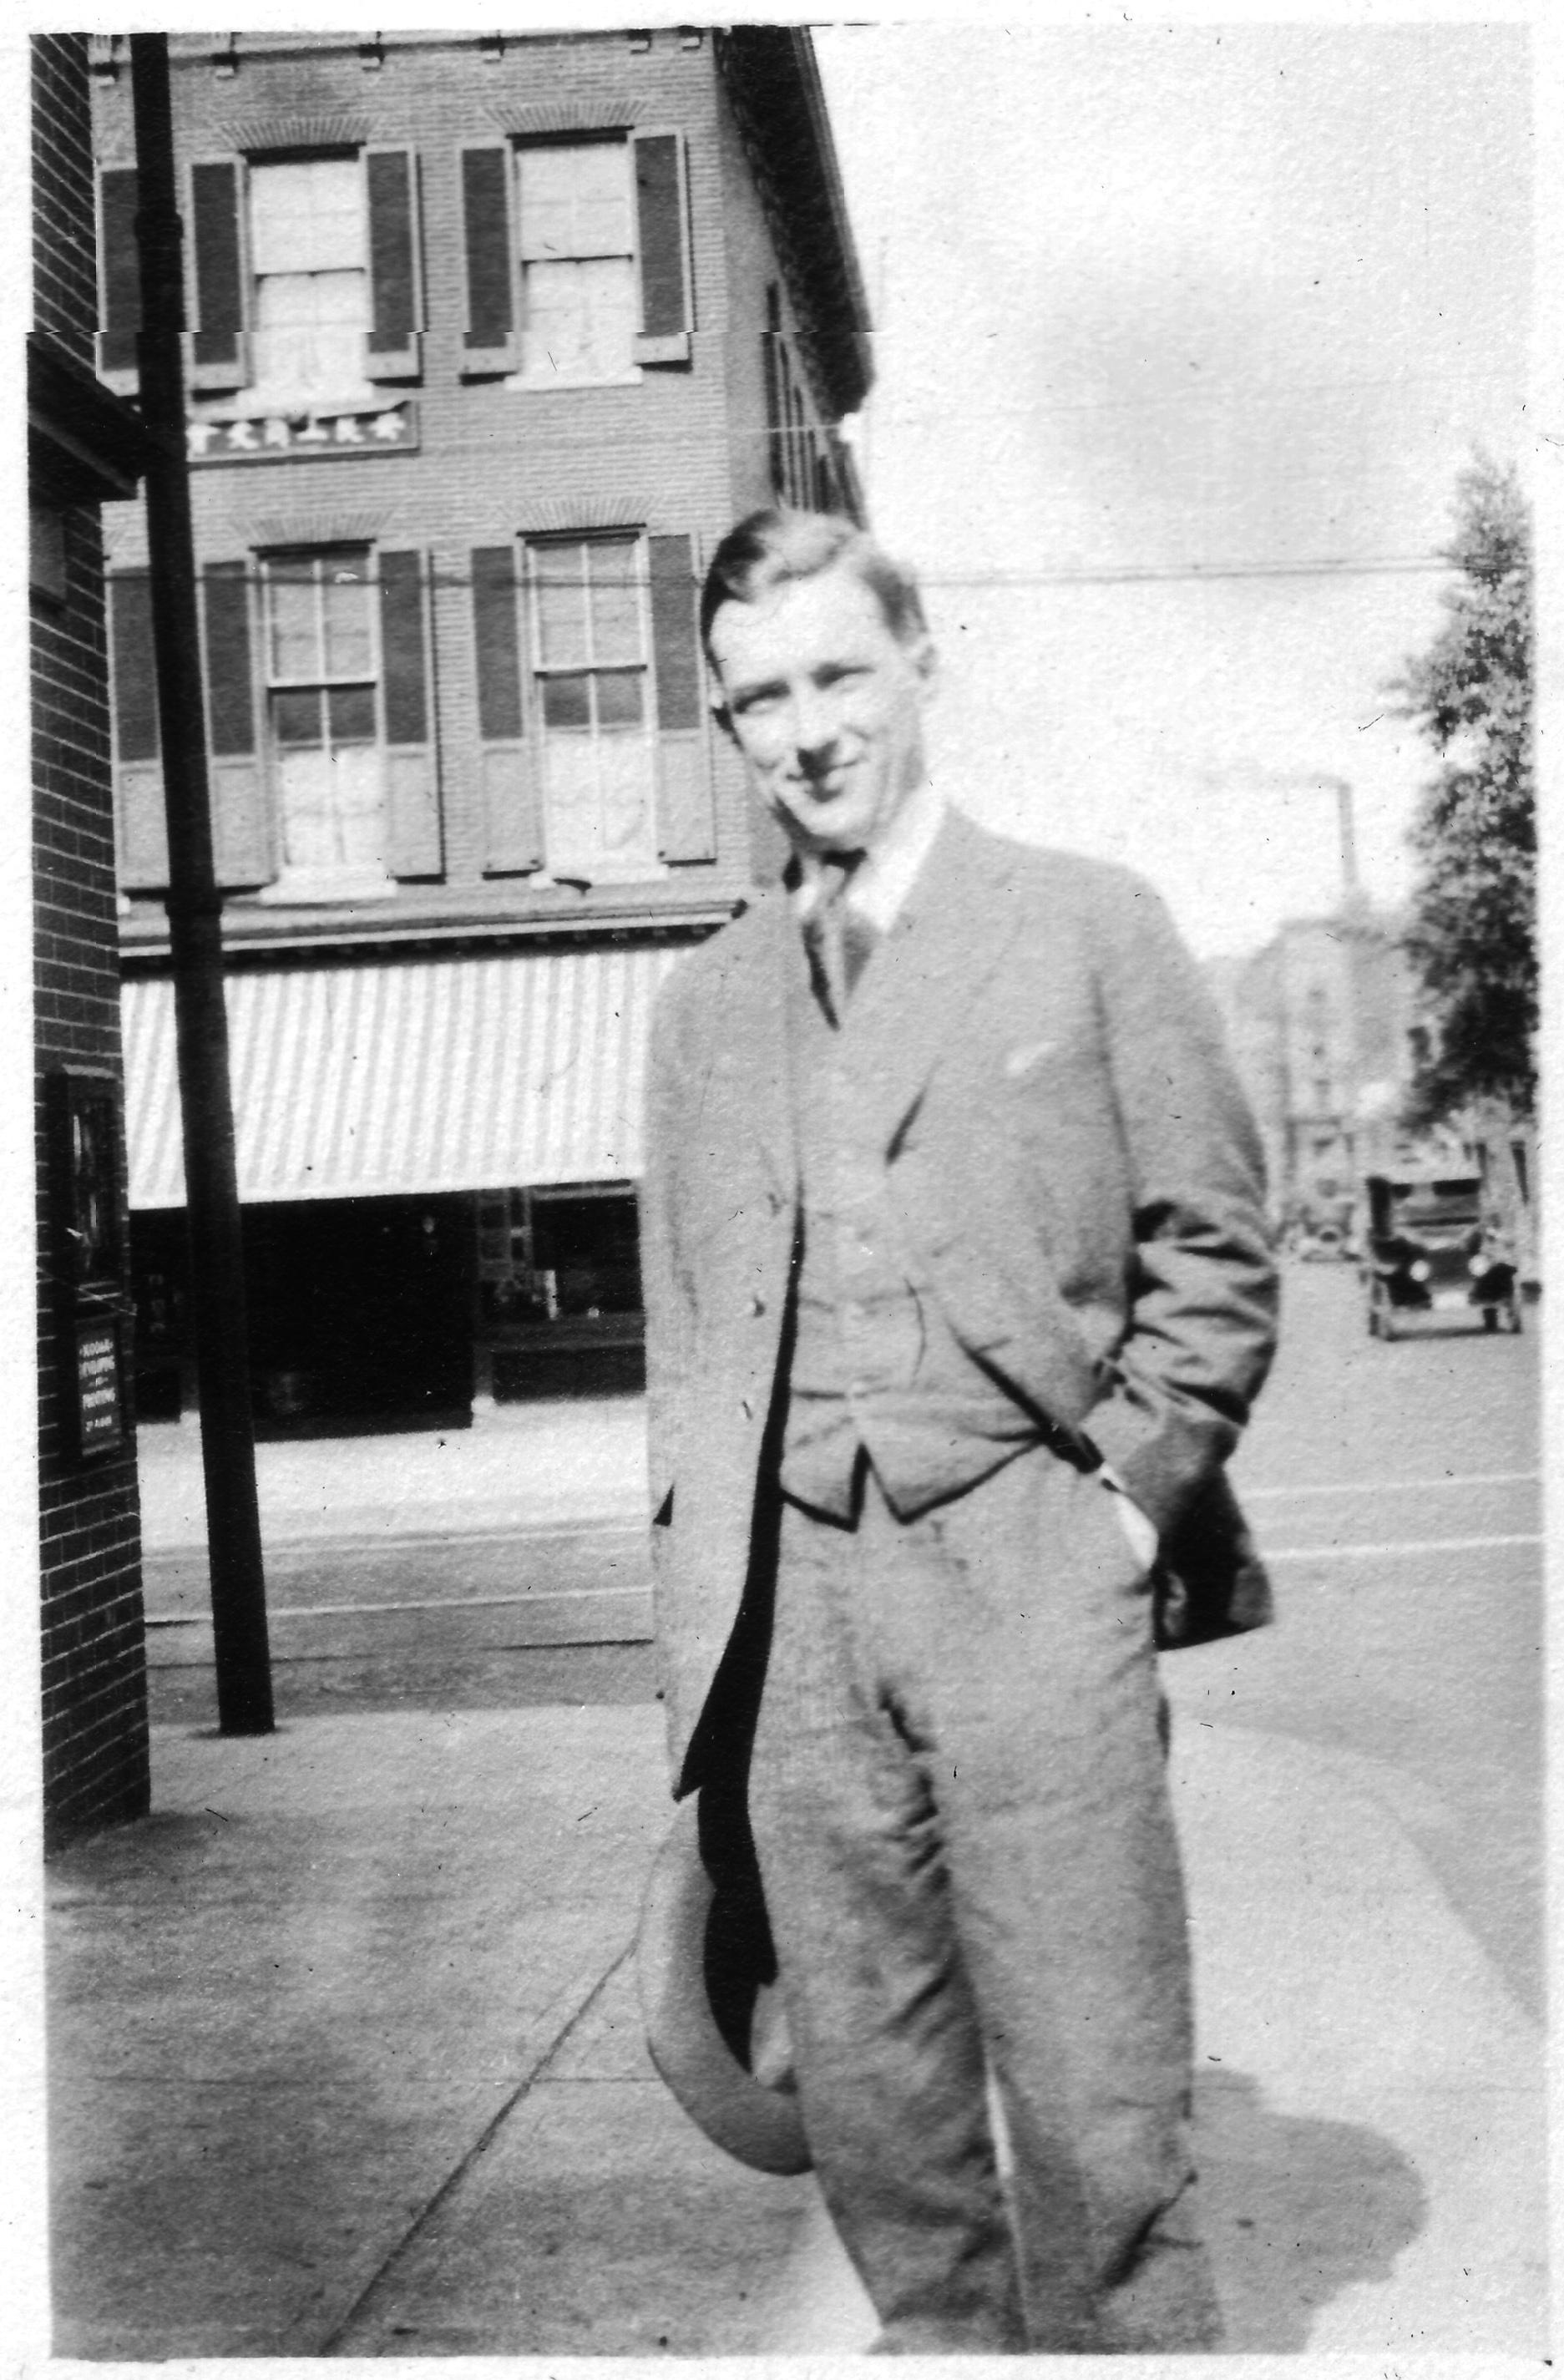 Paul, circa 1920